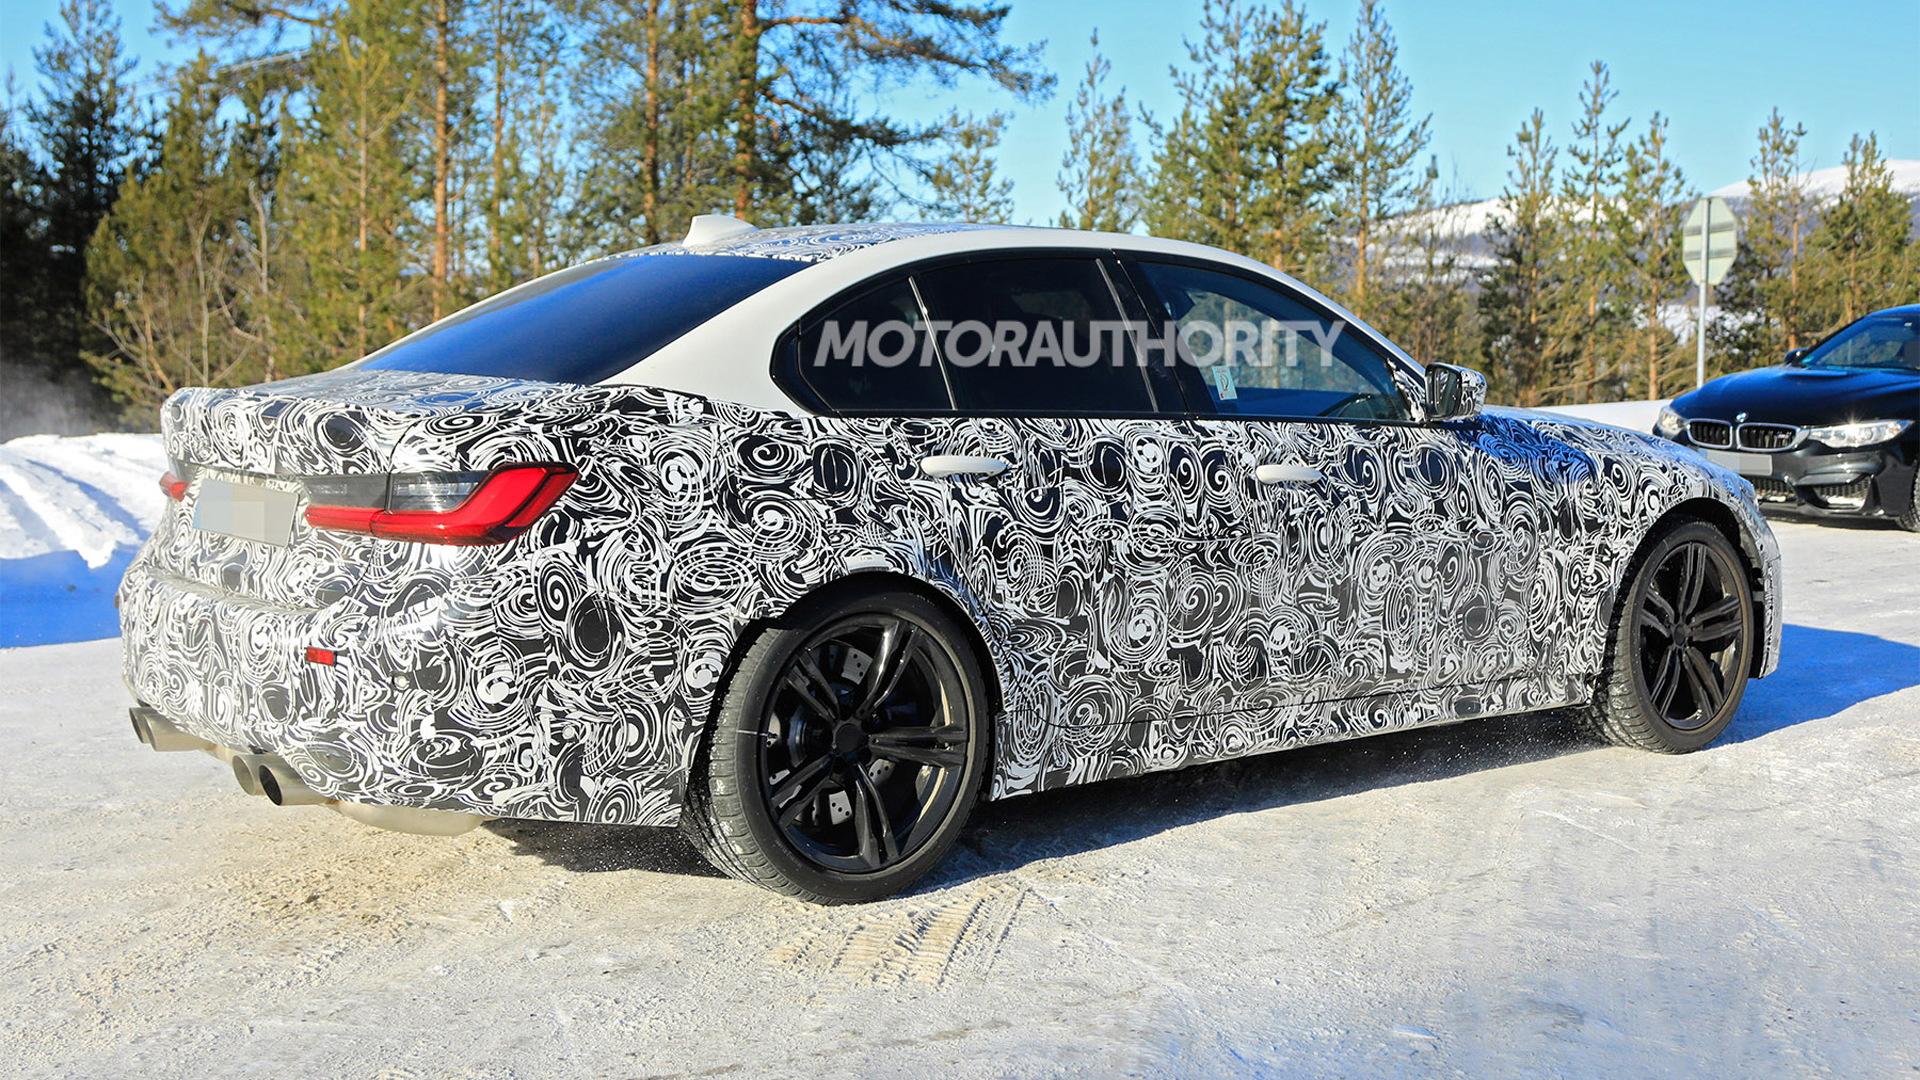 2020 BMW M3 spy shots - Image via S. Baldauf/SB-Medien